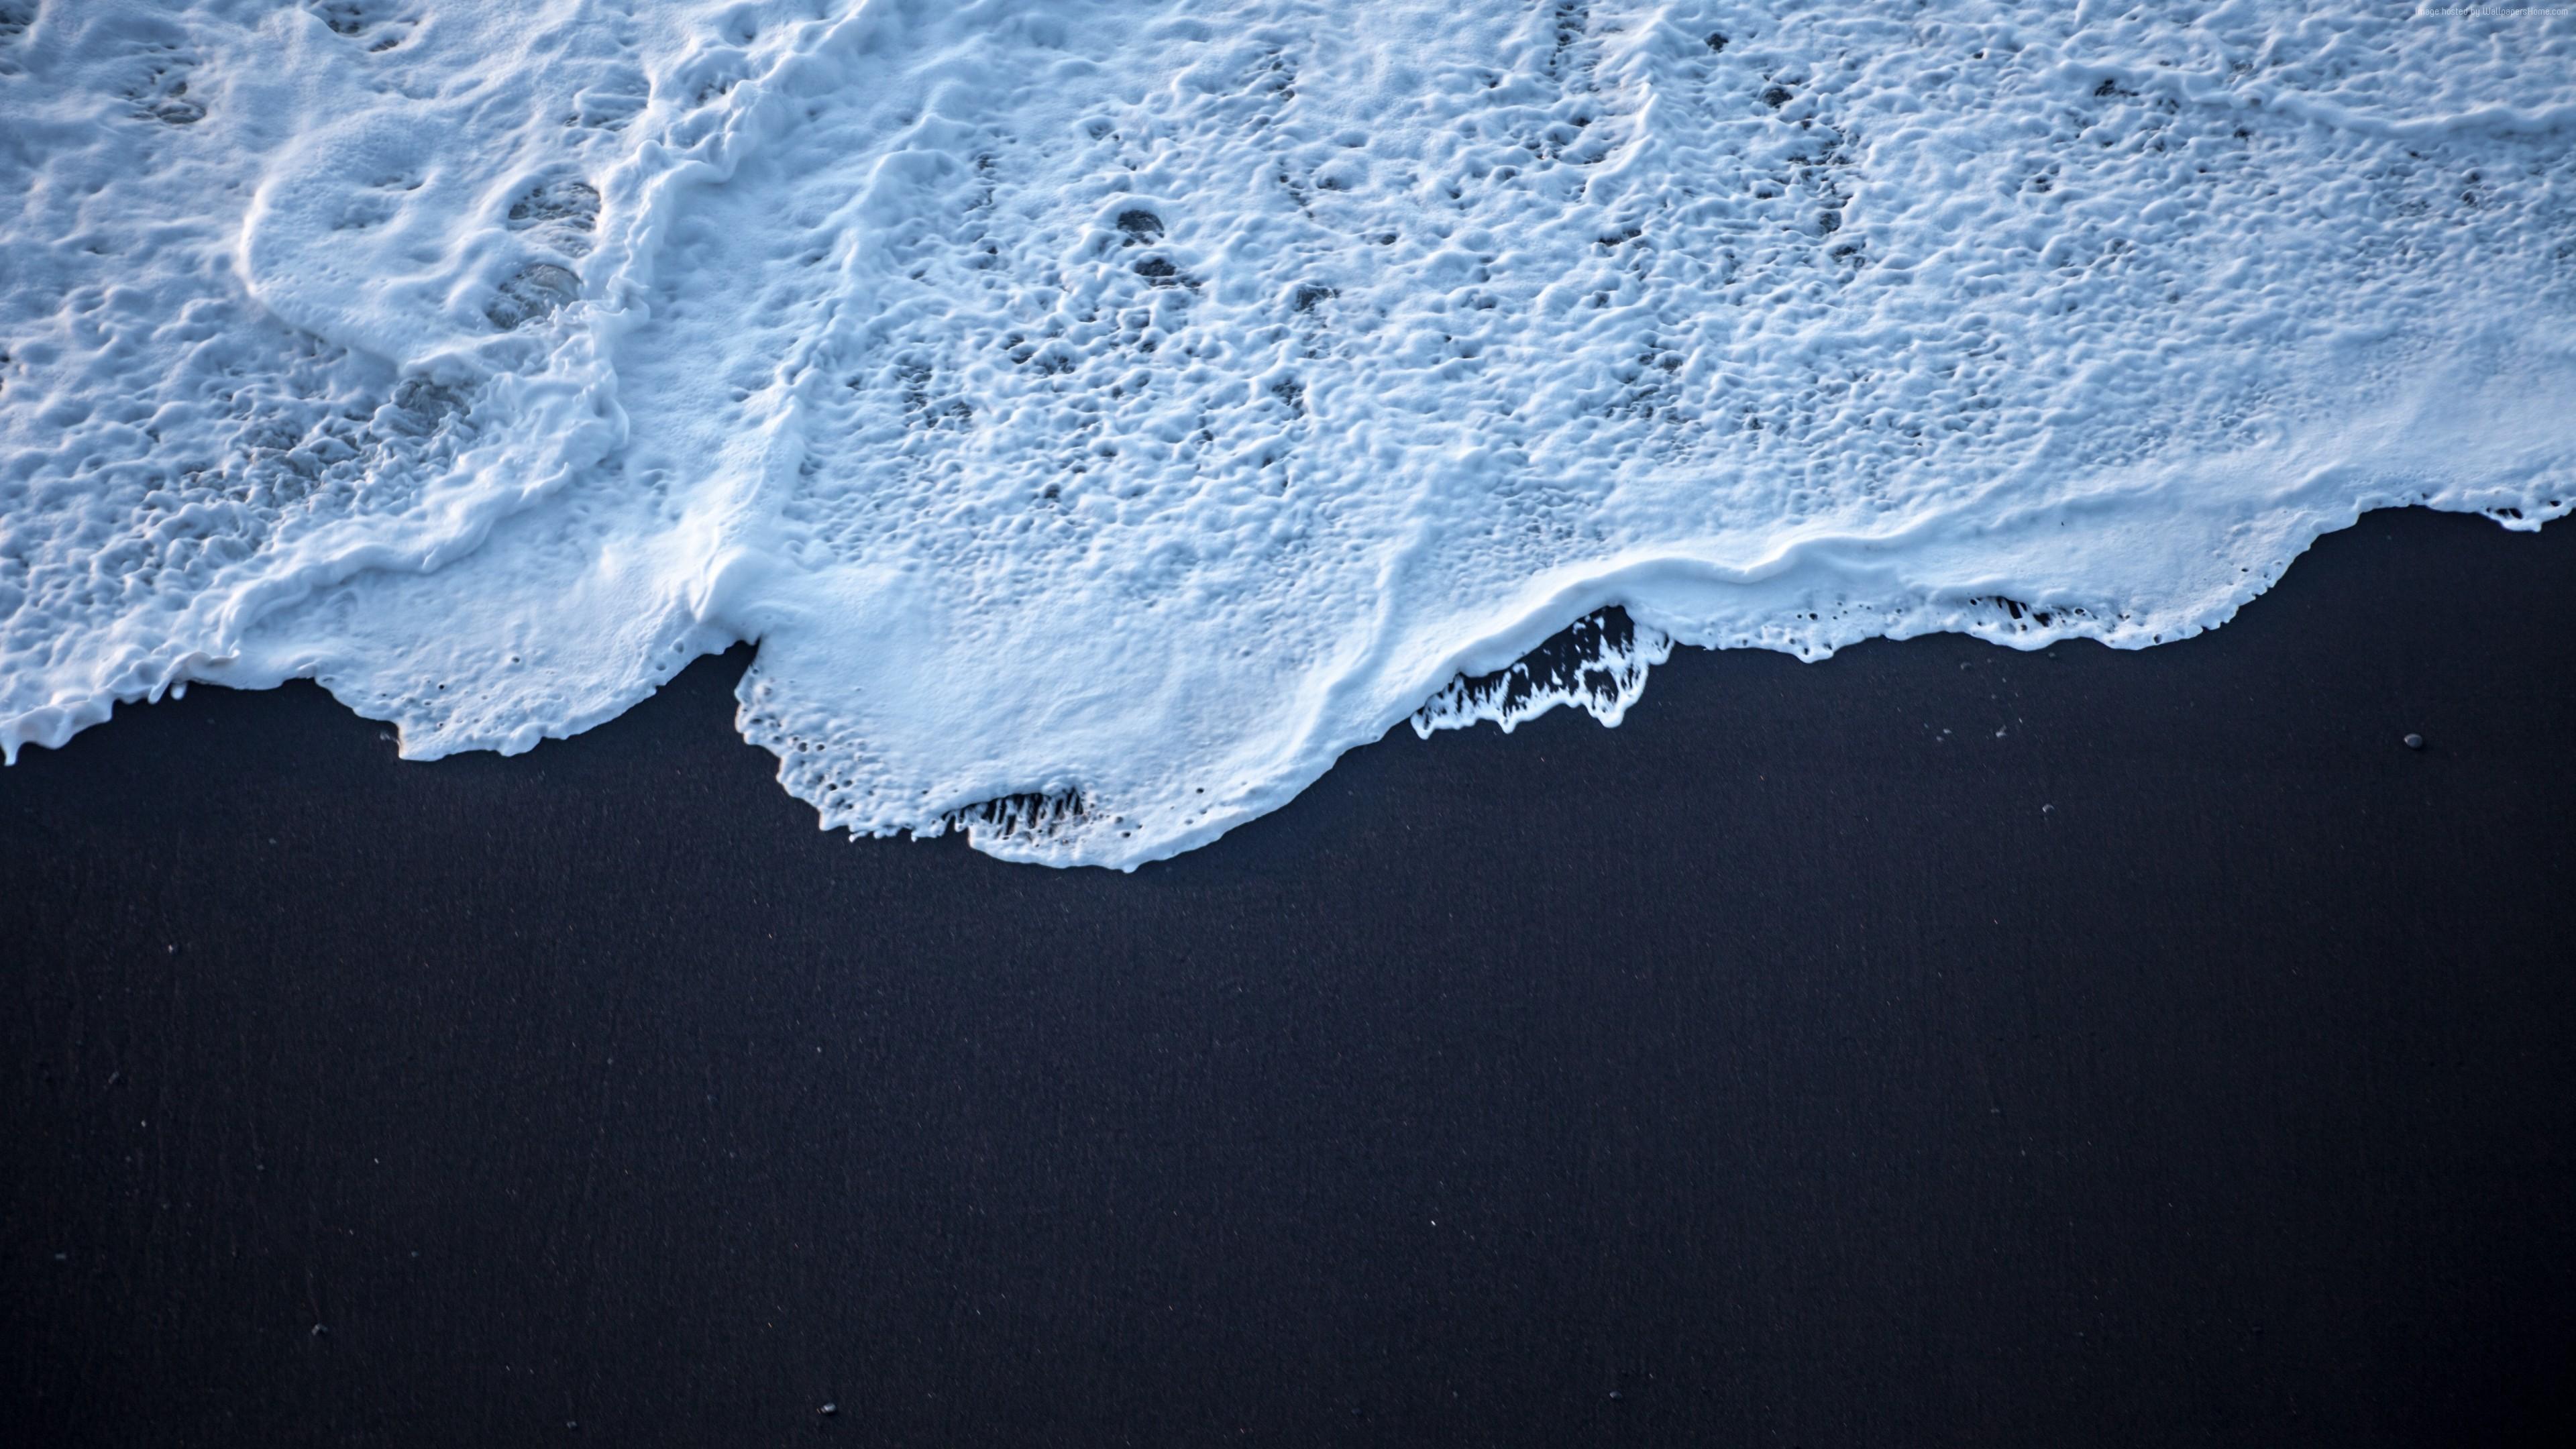 General 3840x2160 nature water sea foam white sand black sand